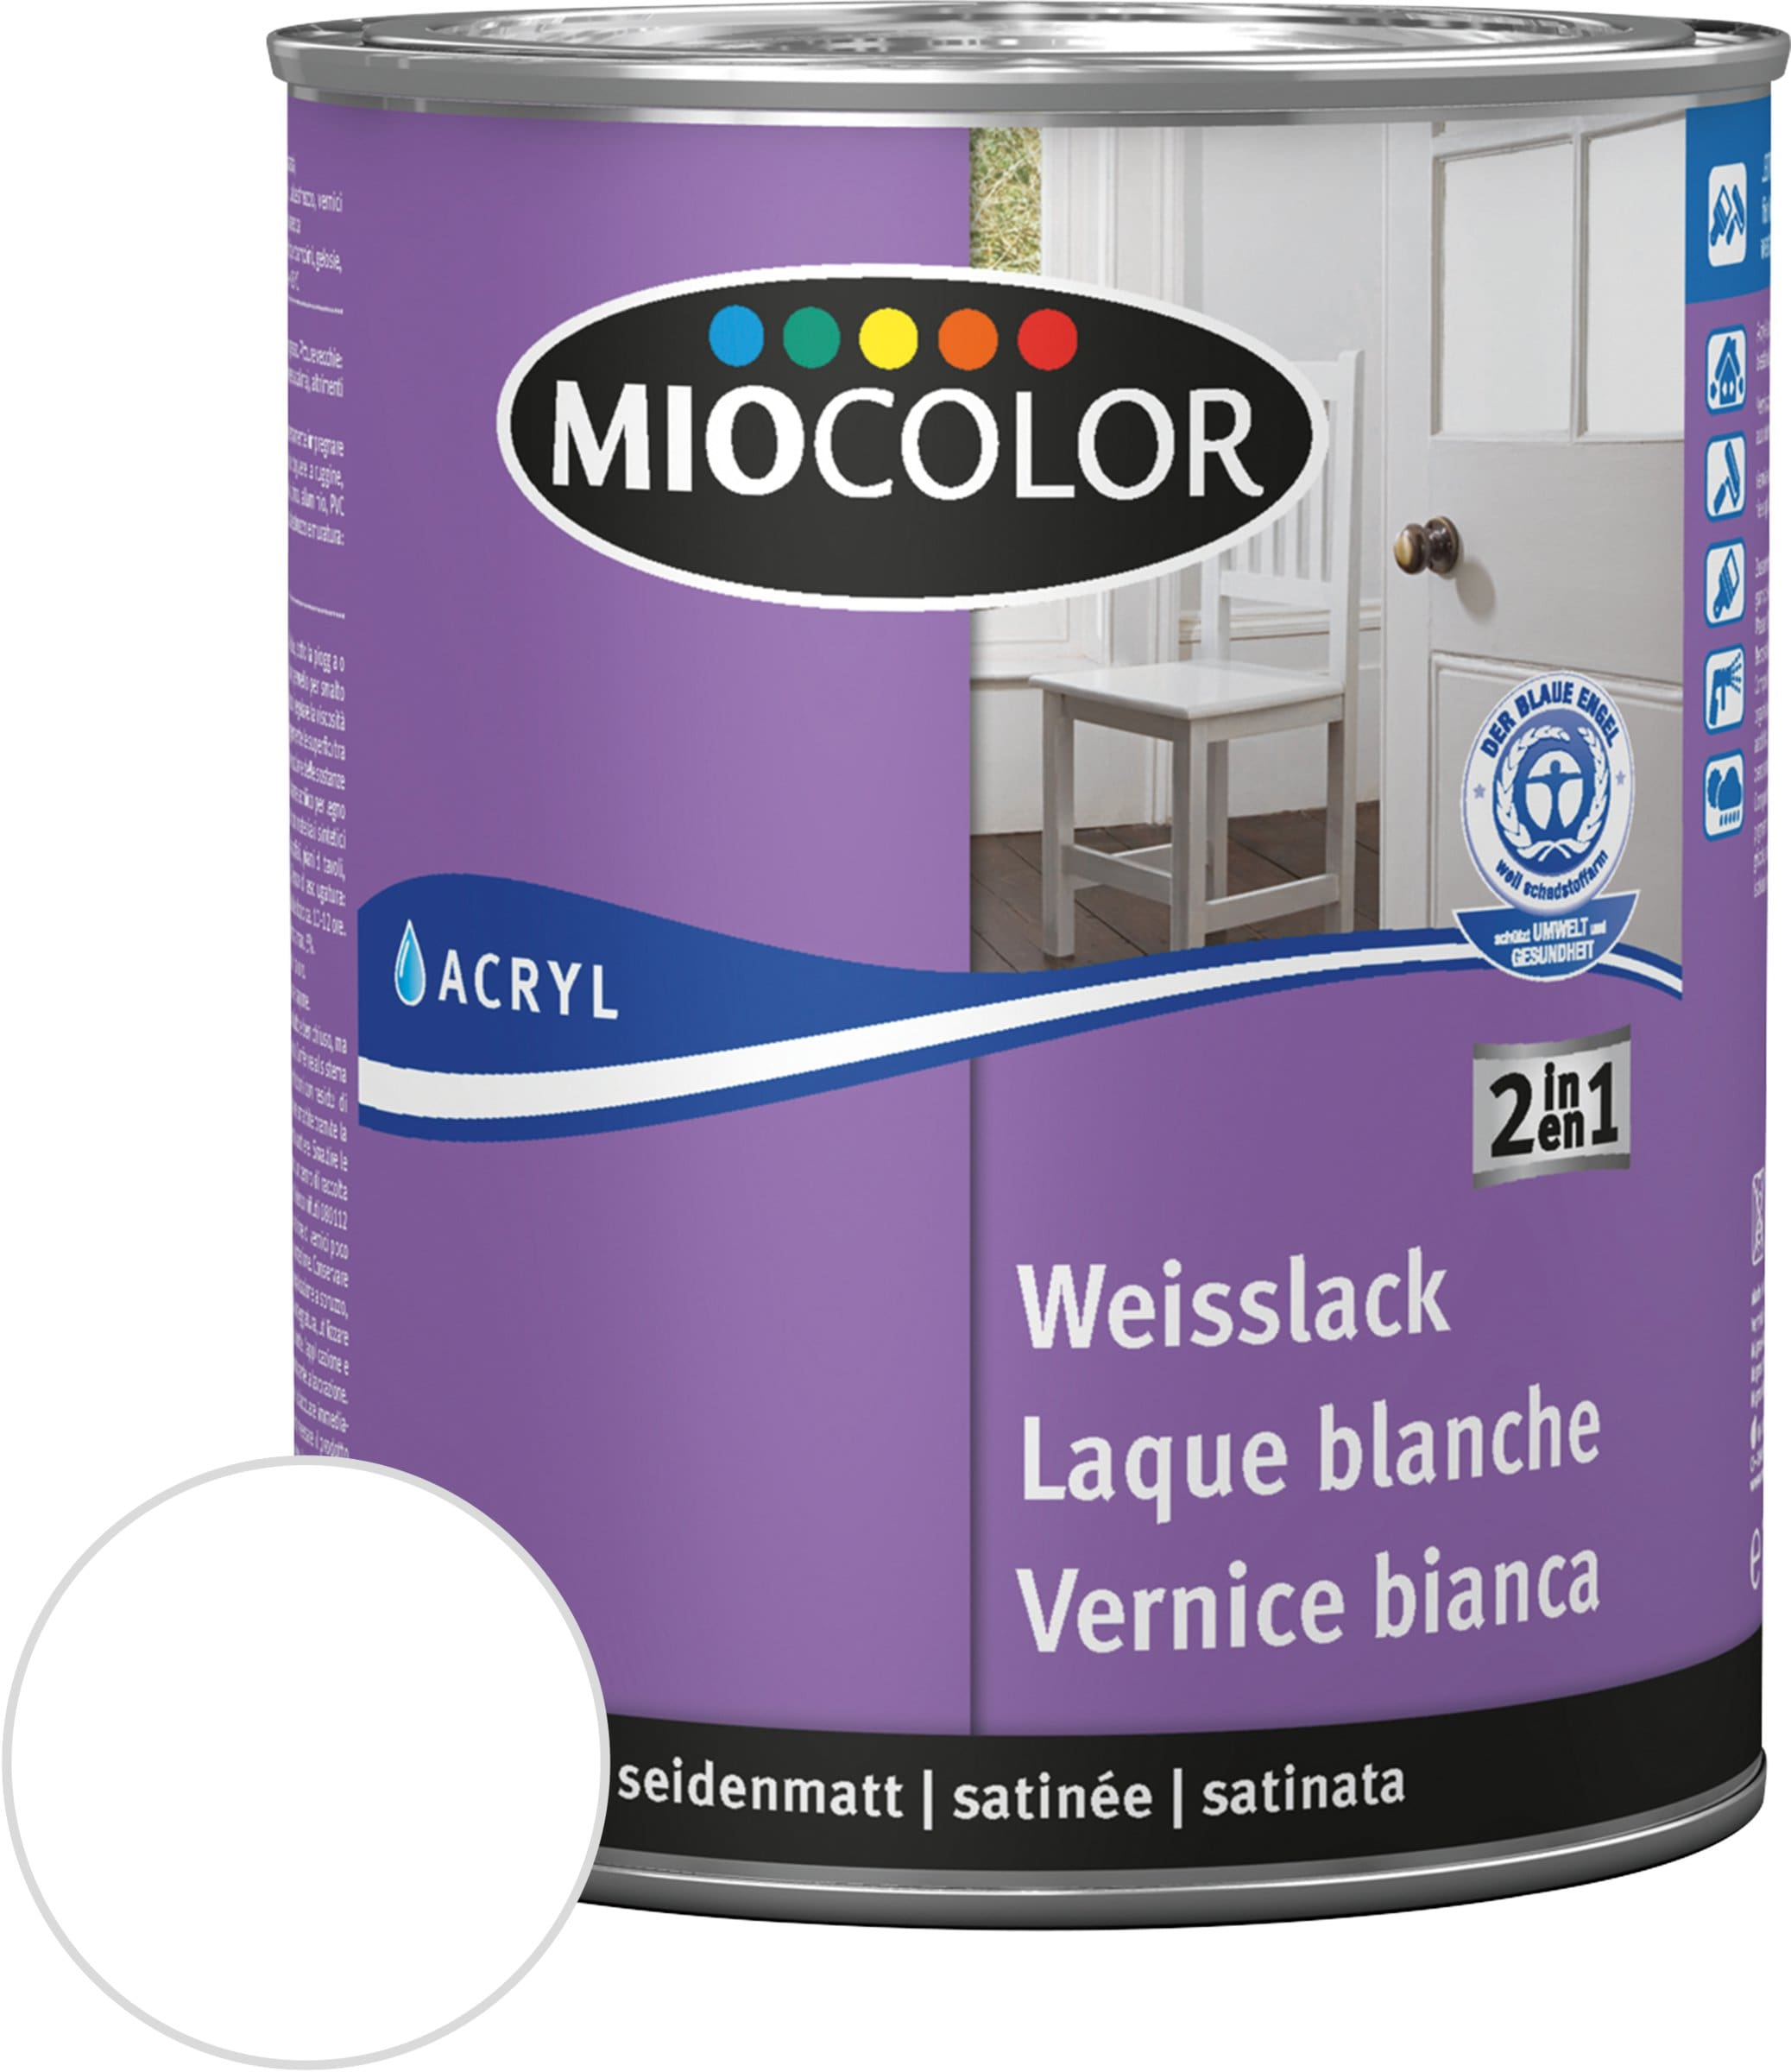 miocolor acryl weisslack seidenmatt migipedia. Black Bedroom Furniture Sets. Home Design Ideas